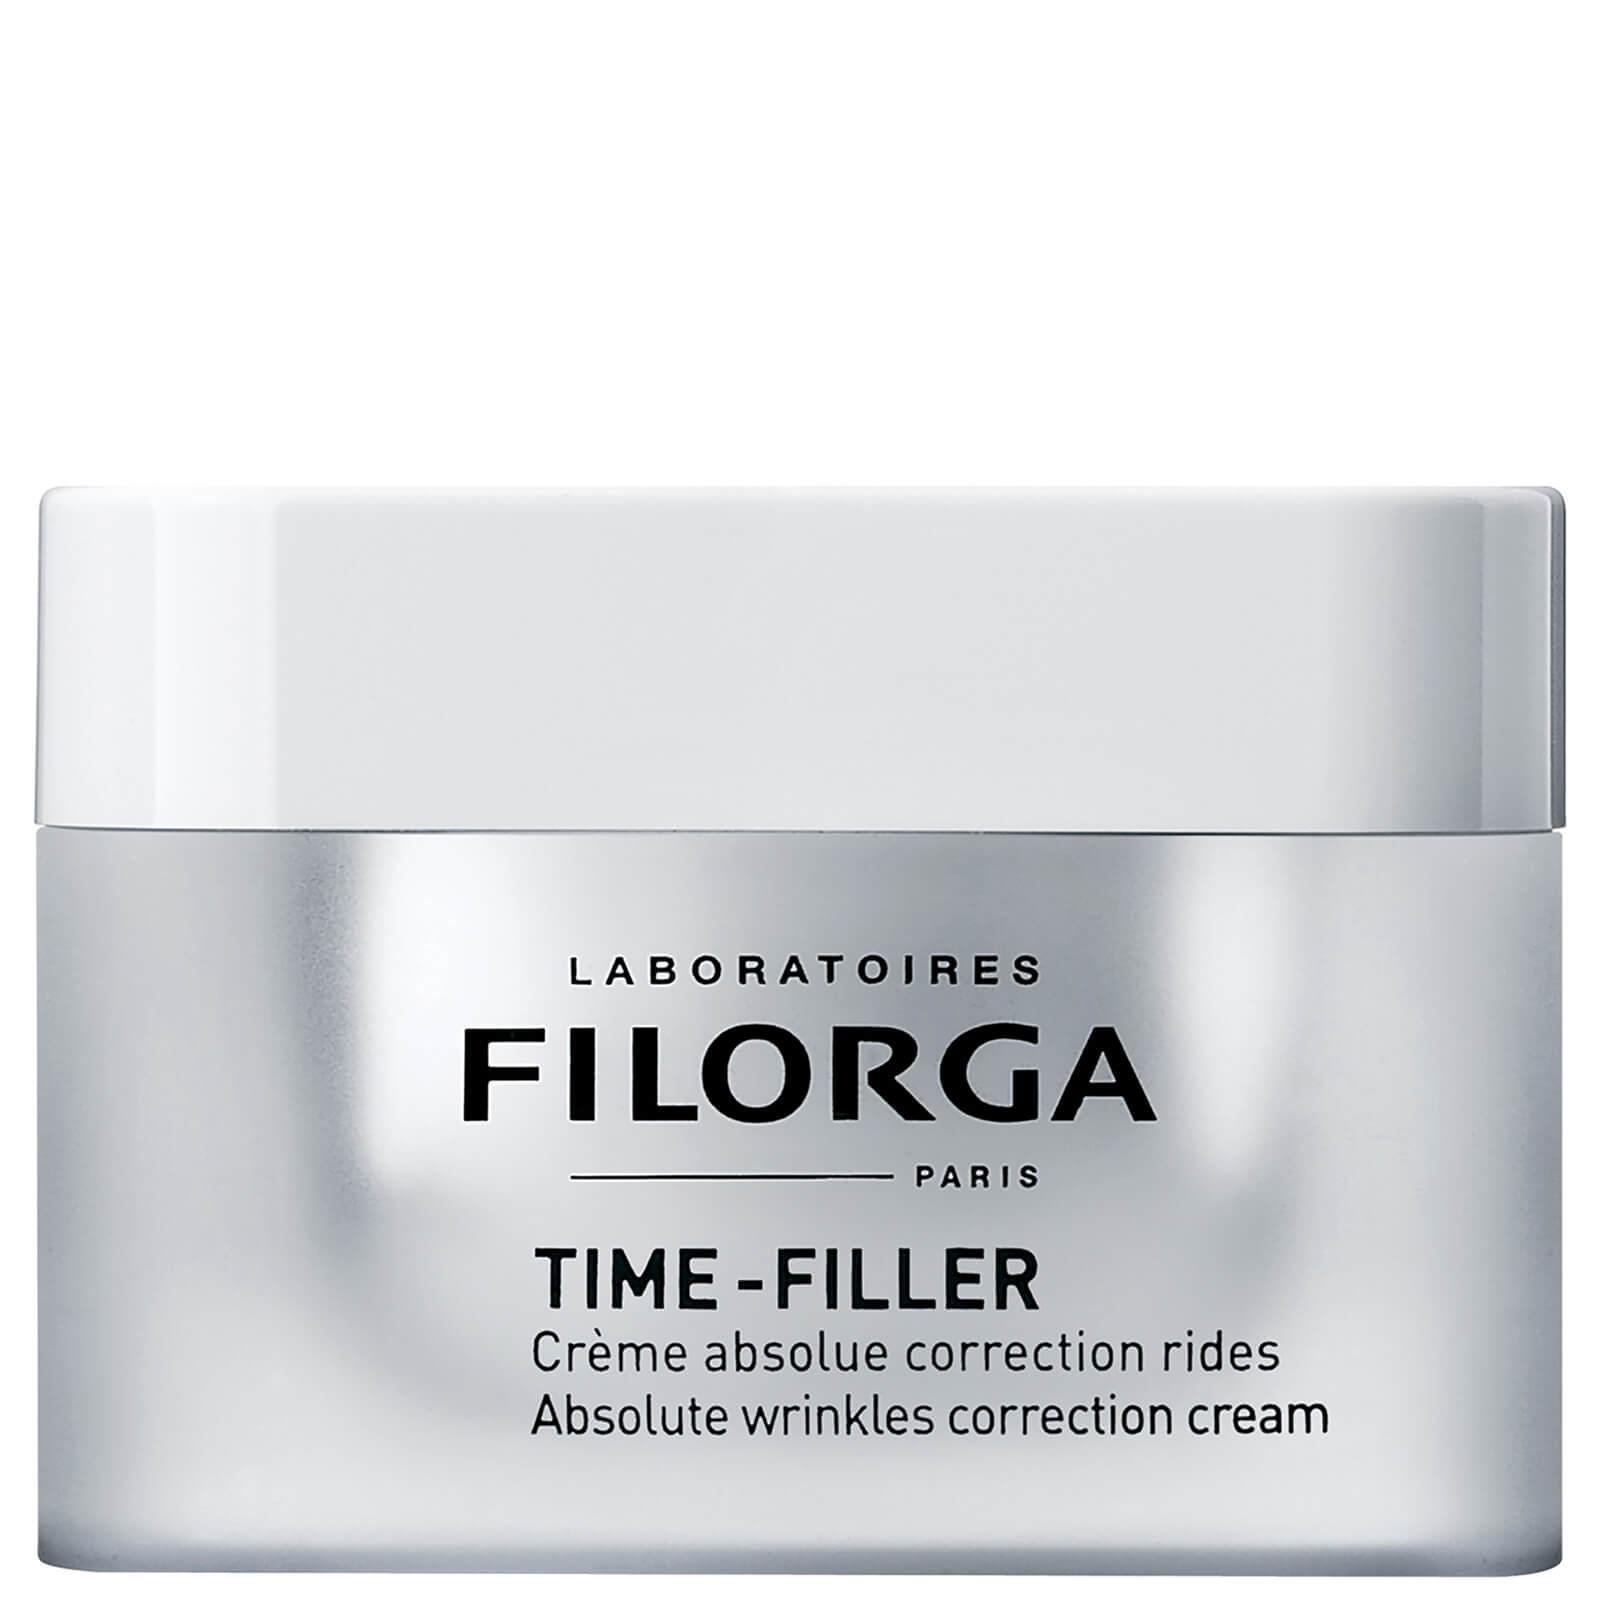 Filorga Time-Filler Cream 50ml